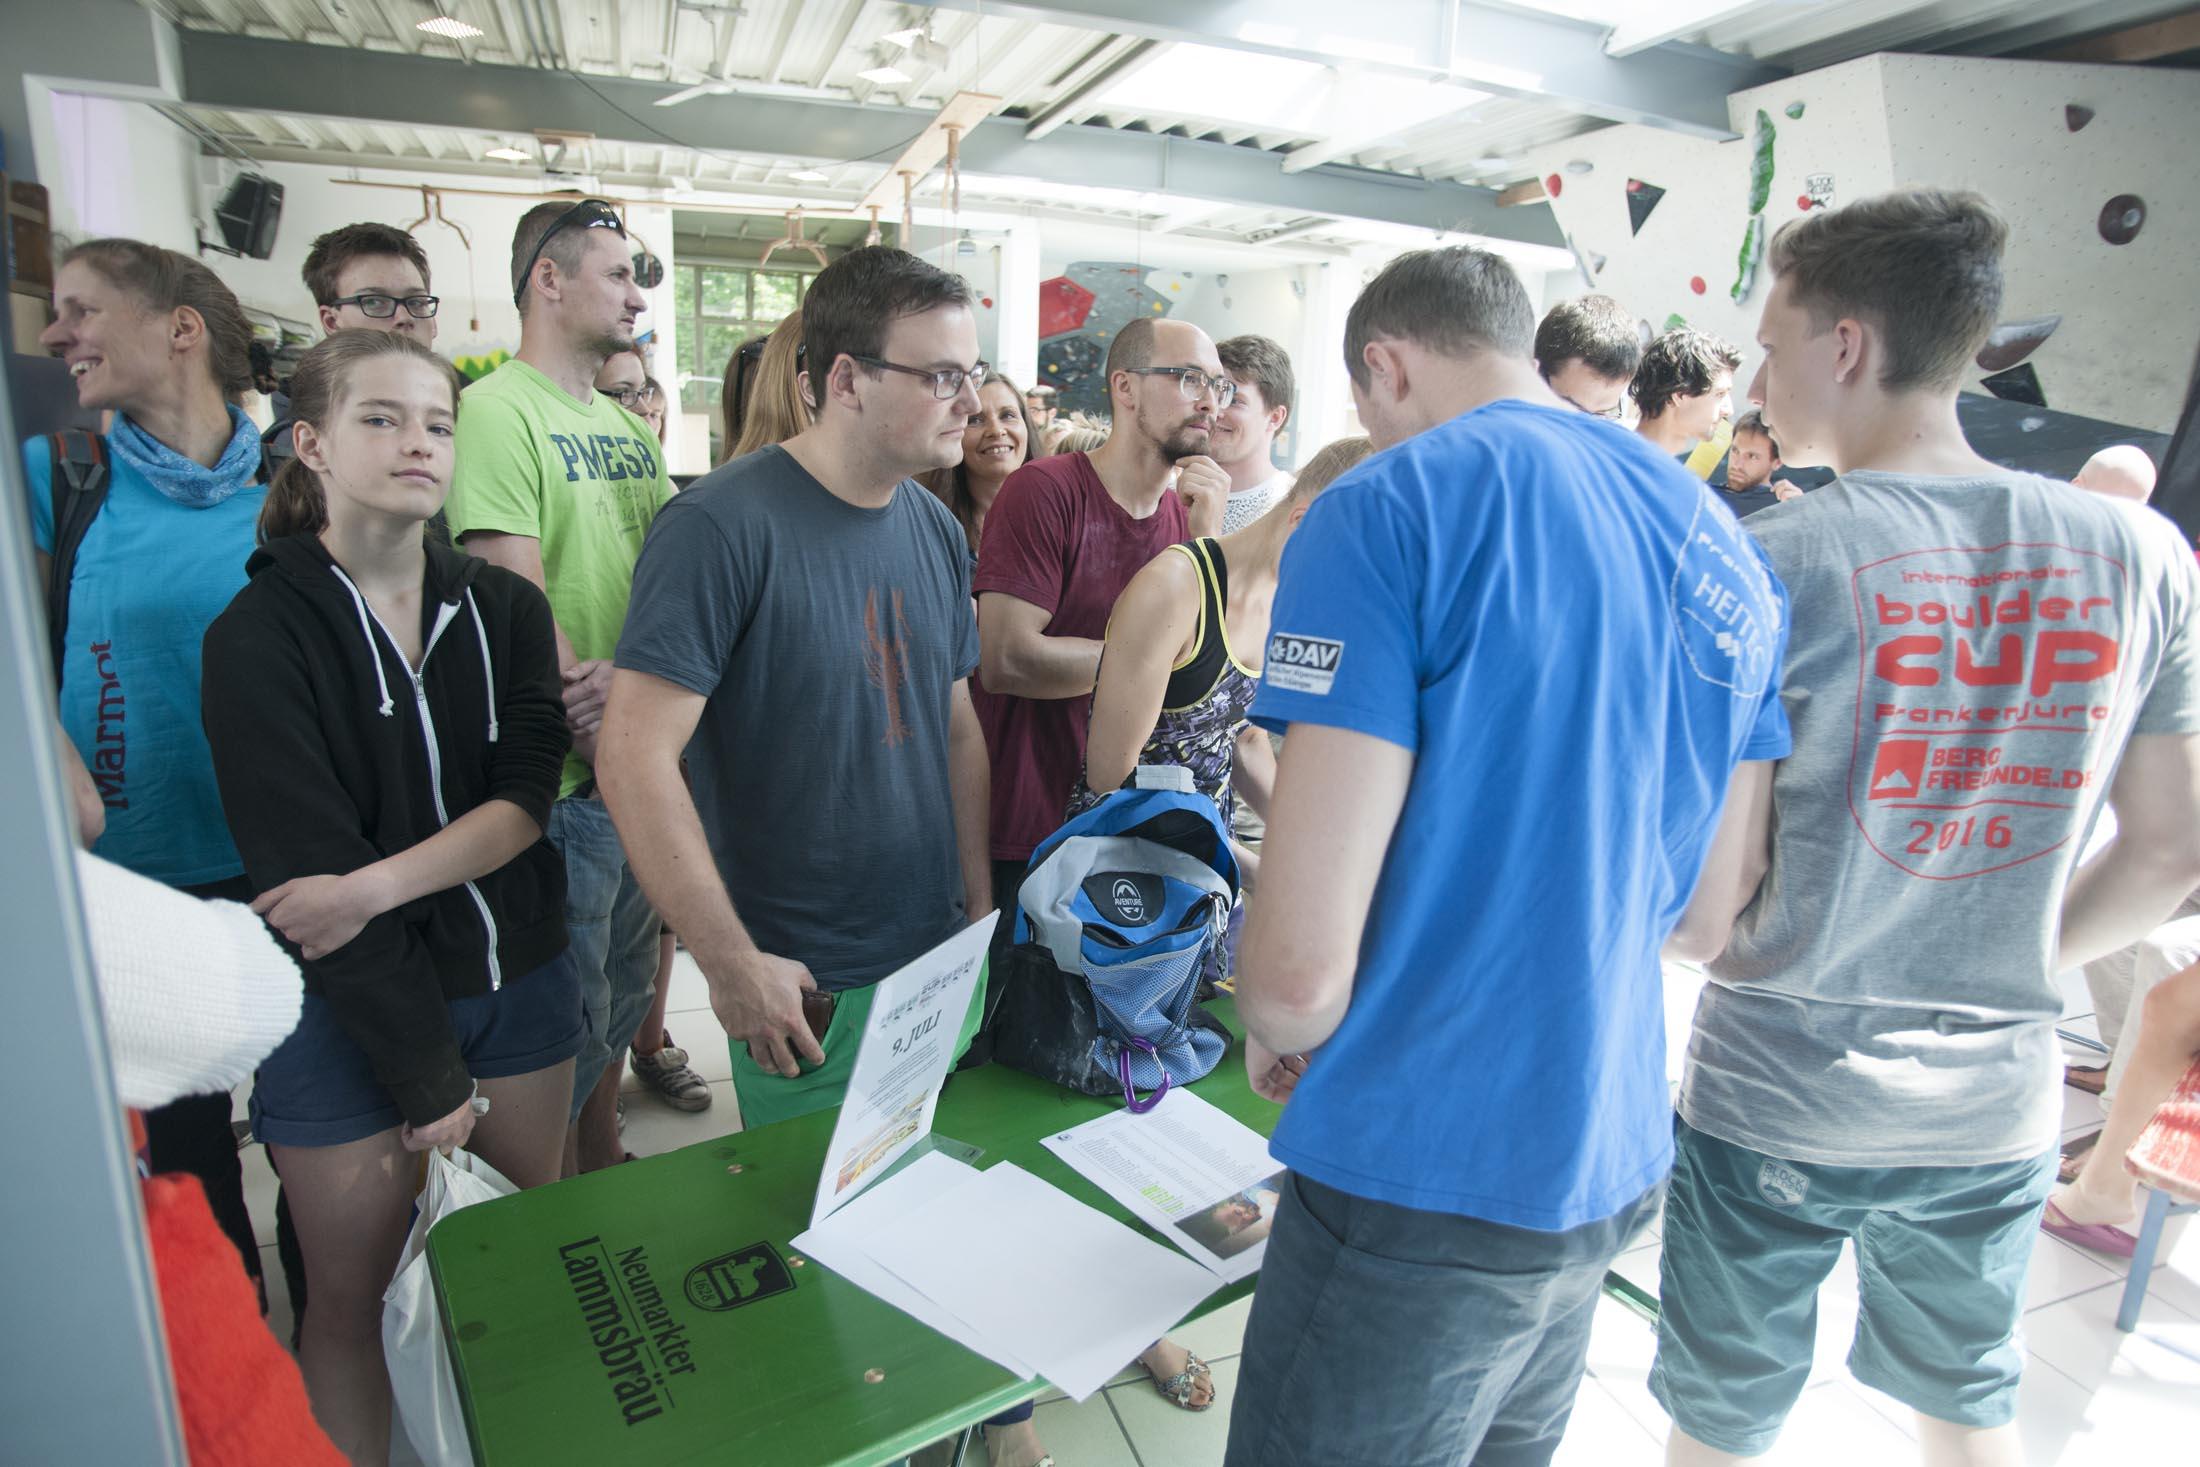 Registration internationaler bouldercup Frankenjura 2016, BLOCKHELDEN Erlangen, Mammut, Bergfreunde.de, Boulderwettkampf07092016055